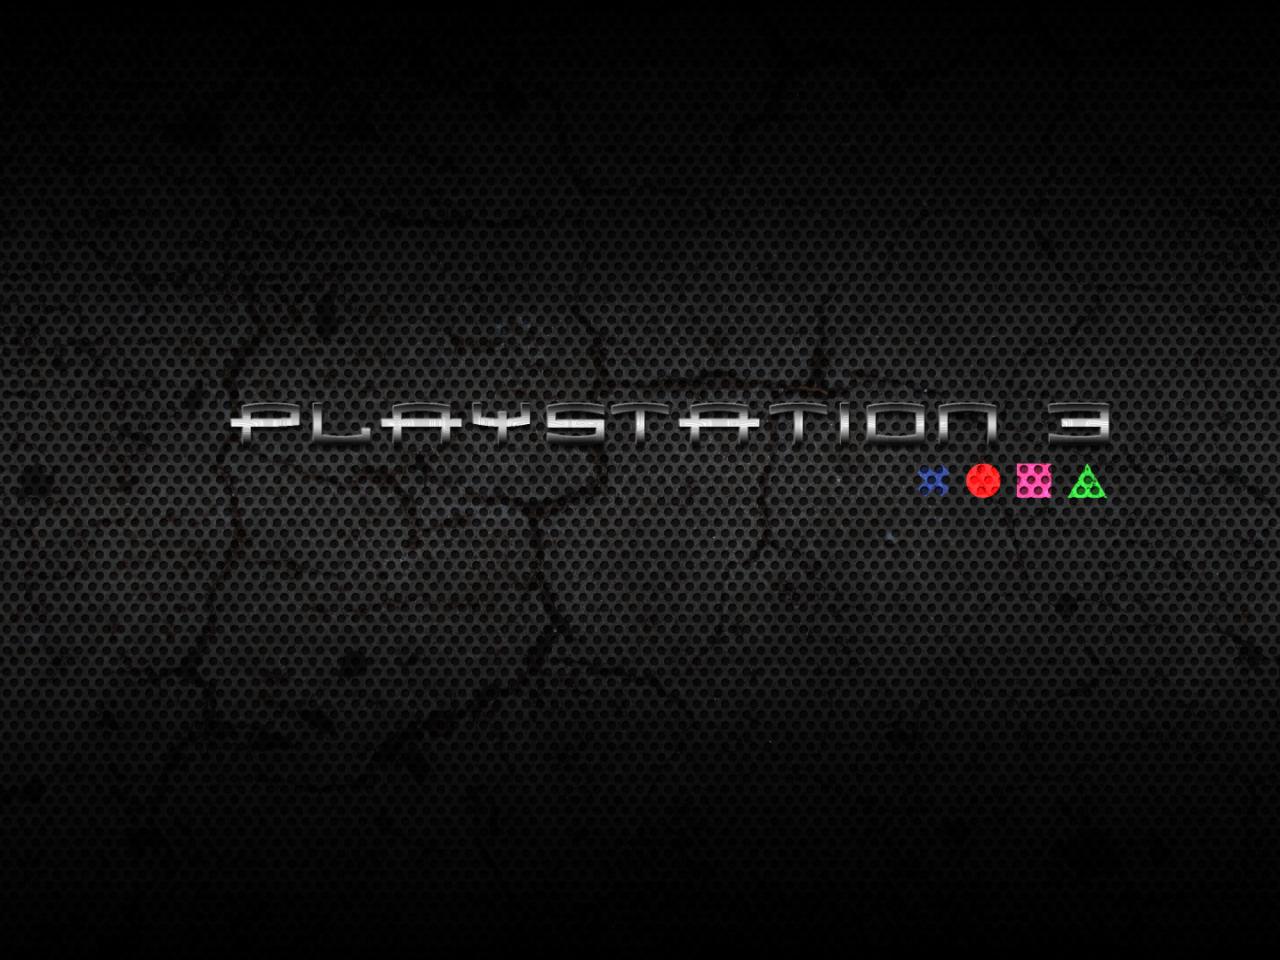 Playstation 3 Carbon Wallpaper Hd Wallpapers